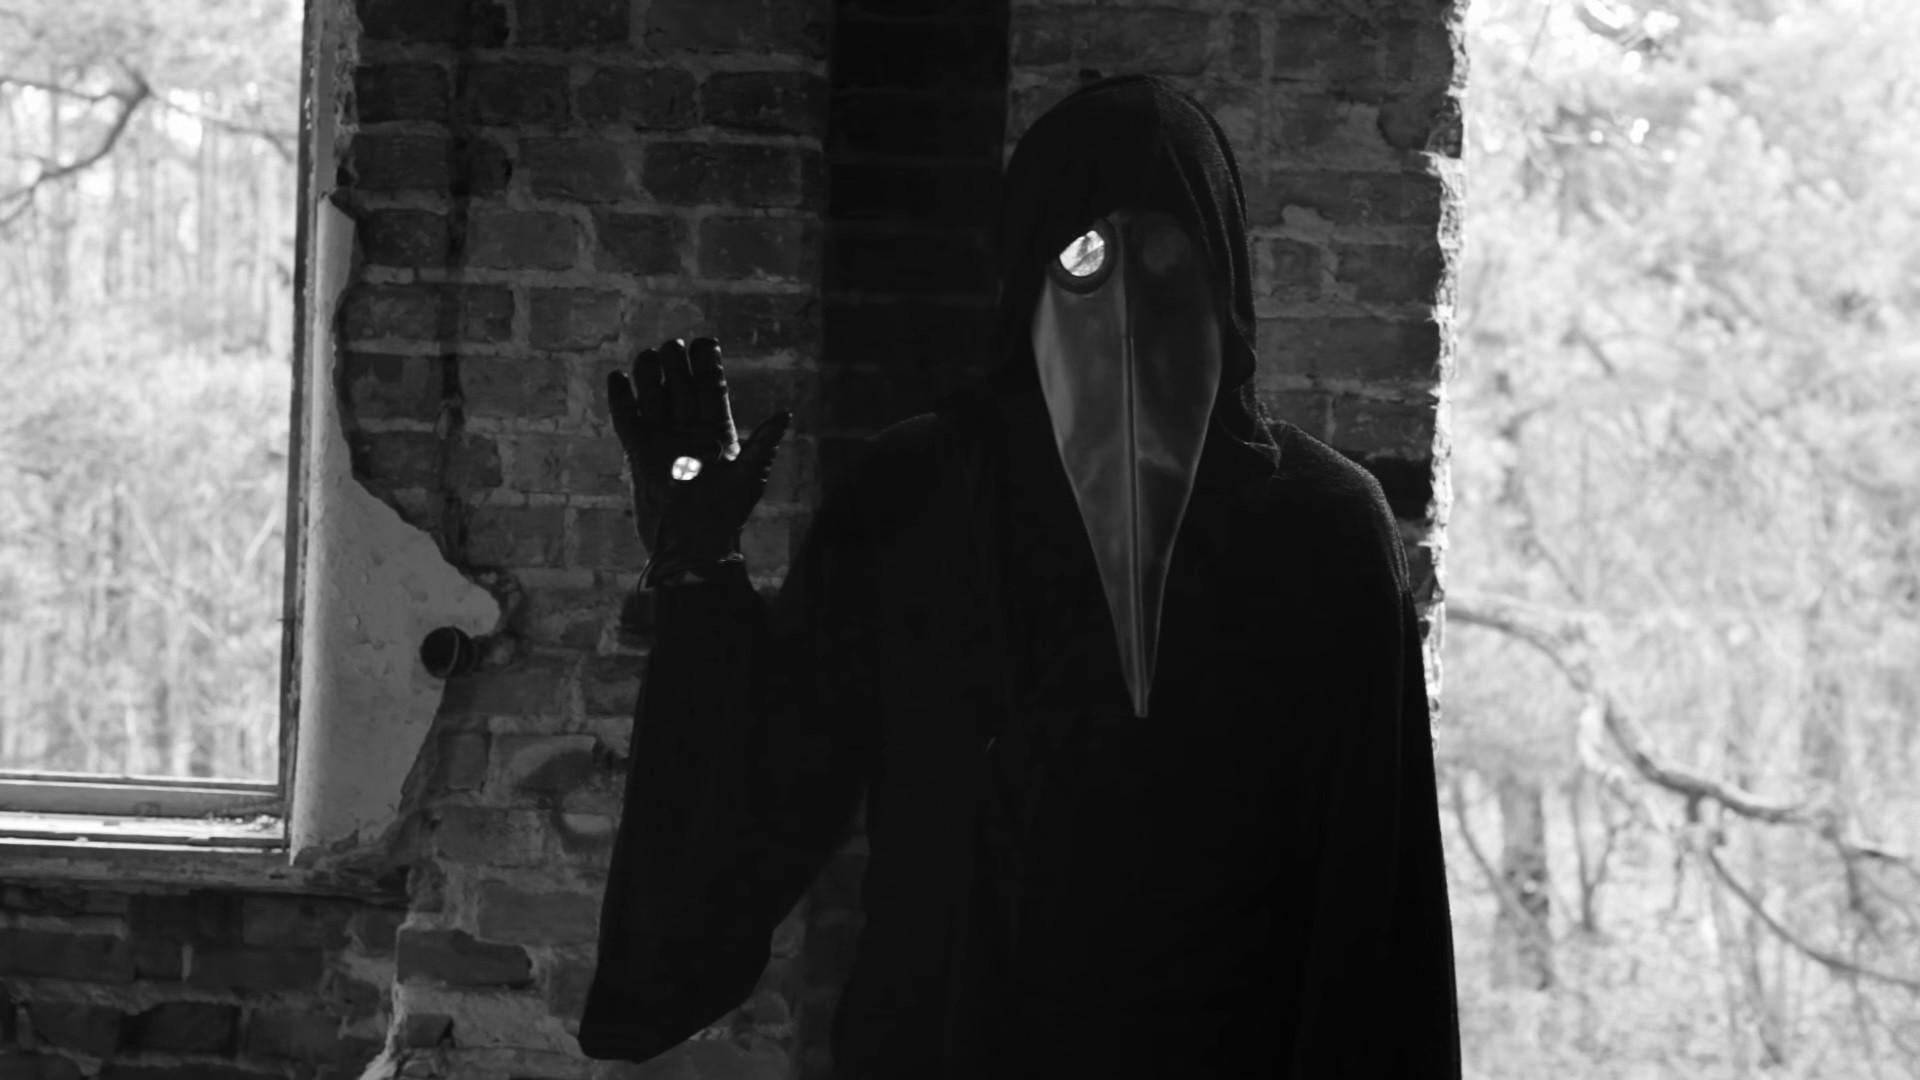 Creepy 11B-X-1371 Video masked man